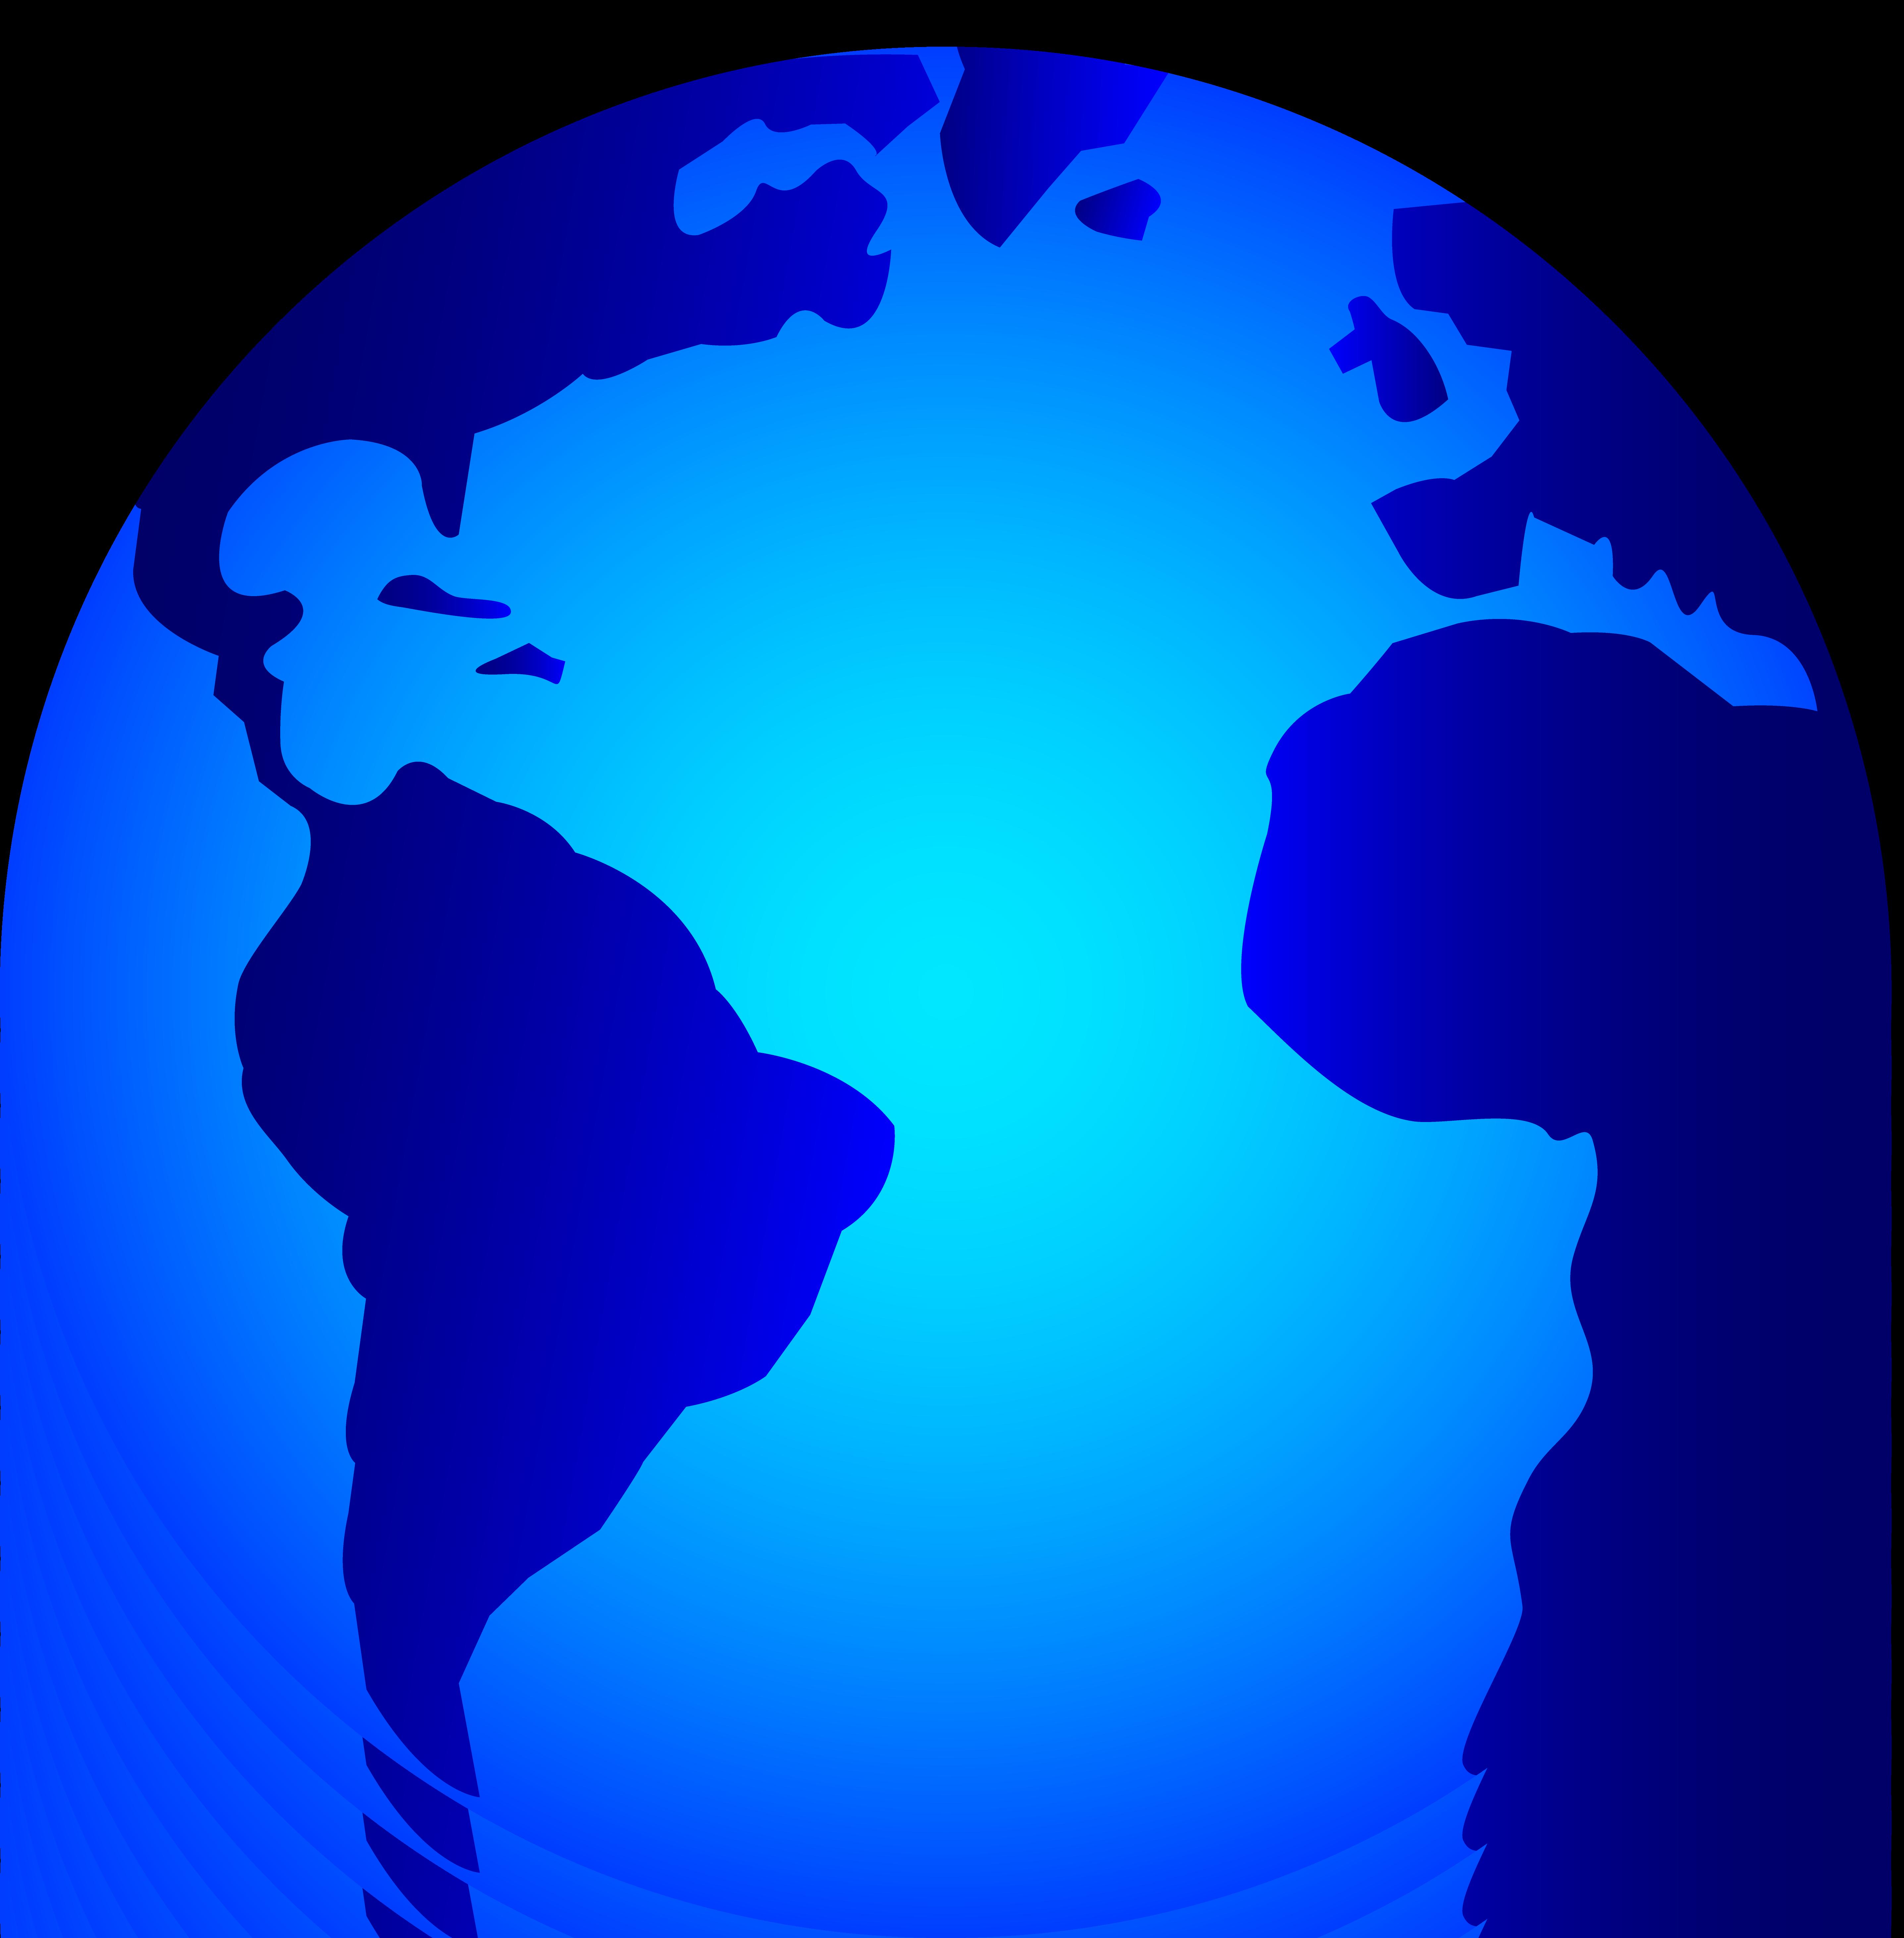 Globe clipart vector clip library stock Free Free Vector Earth, Download Free Clip Art, Free Clip Art on ... clip library stock